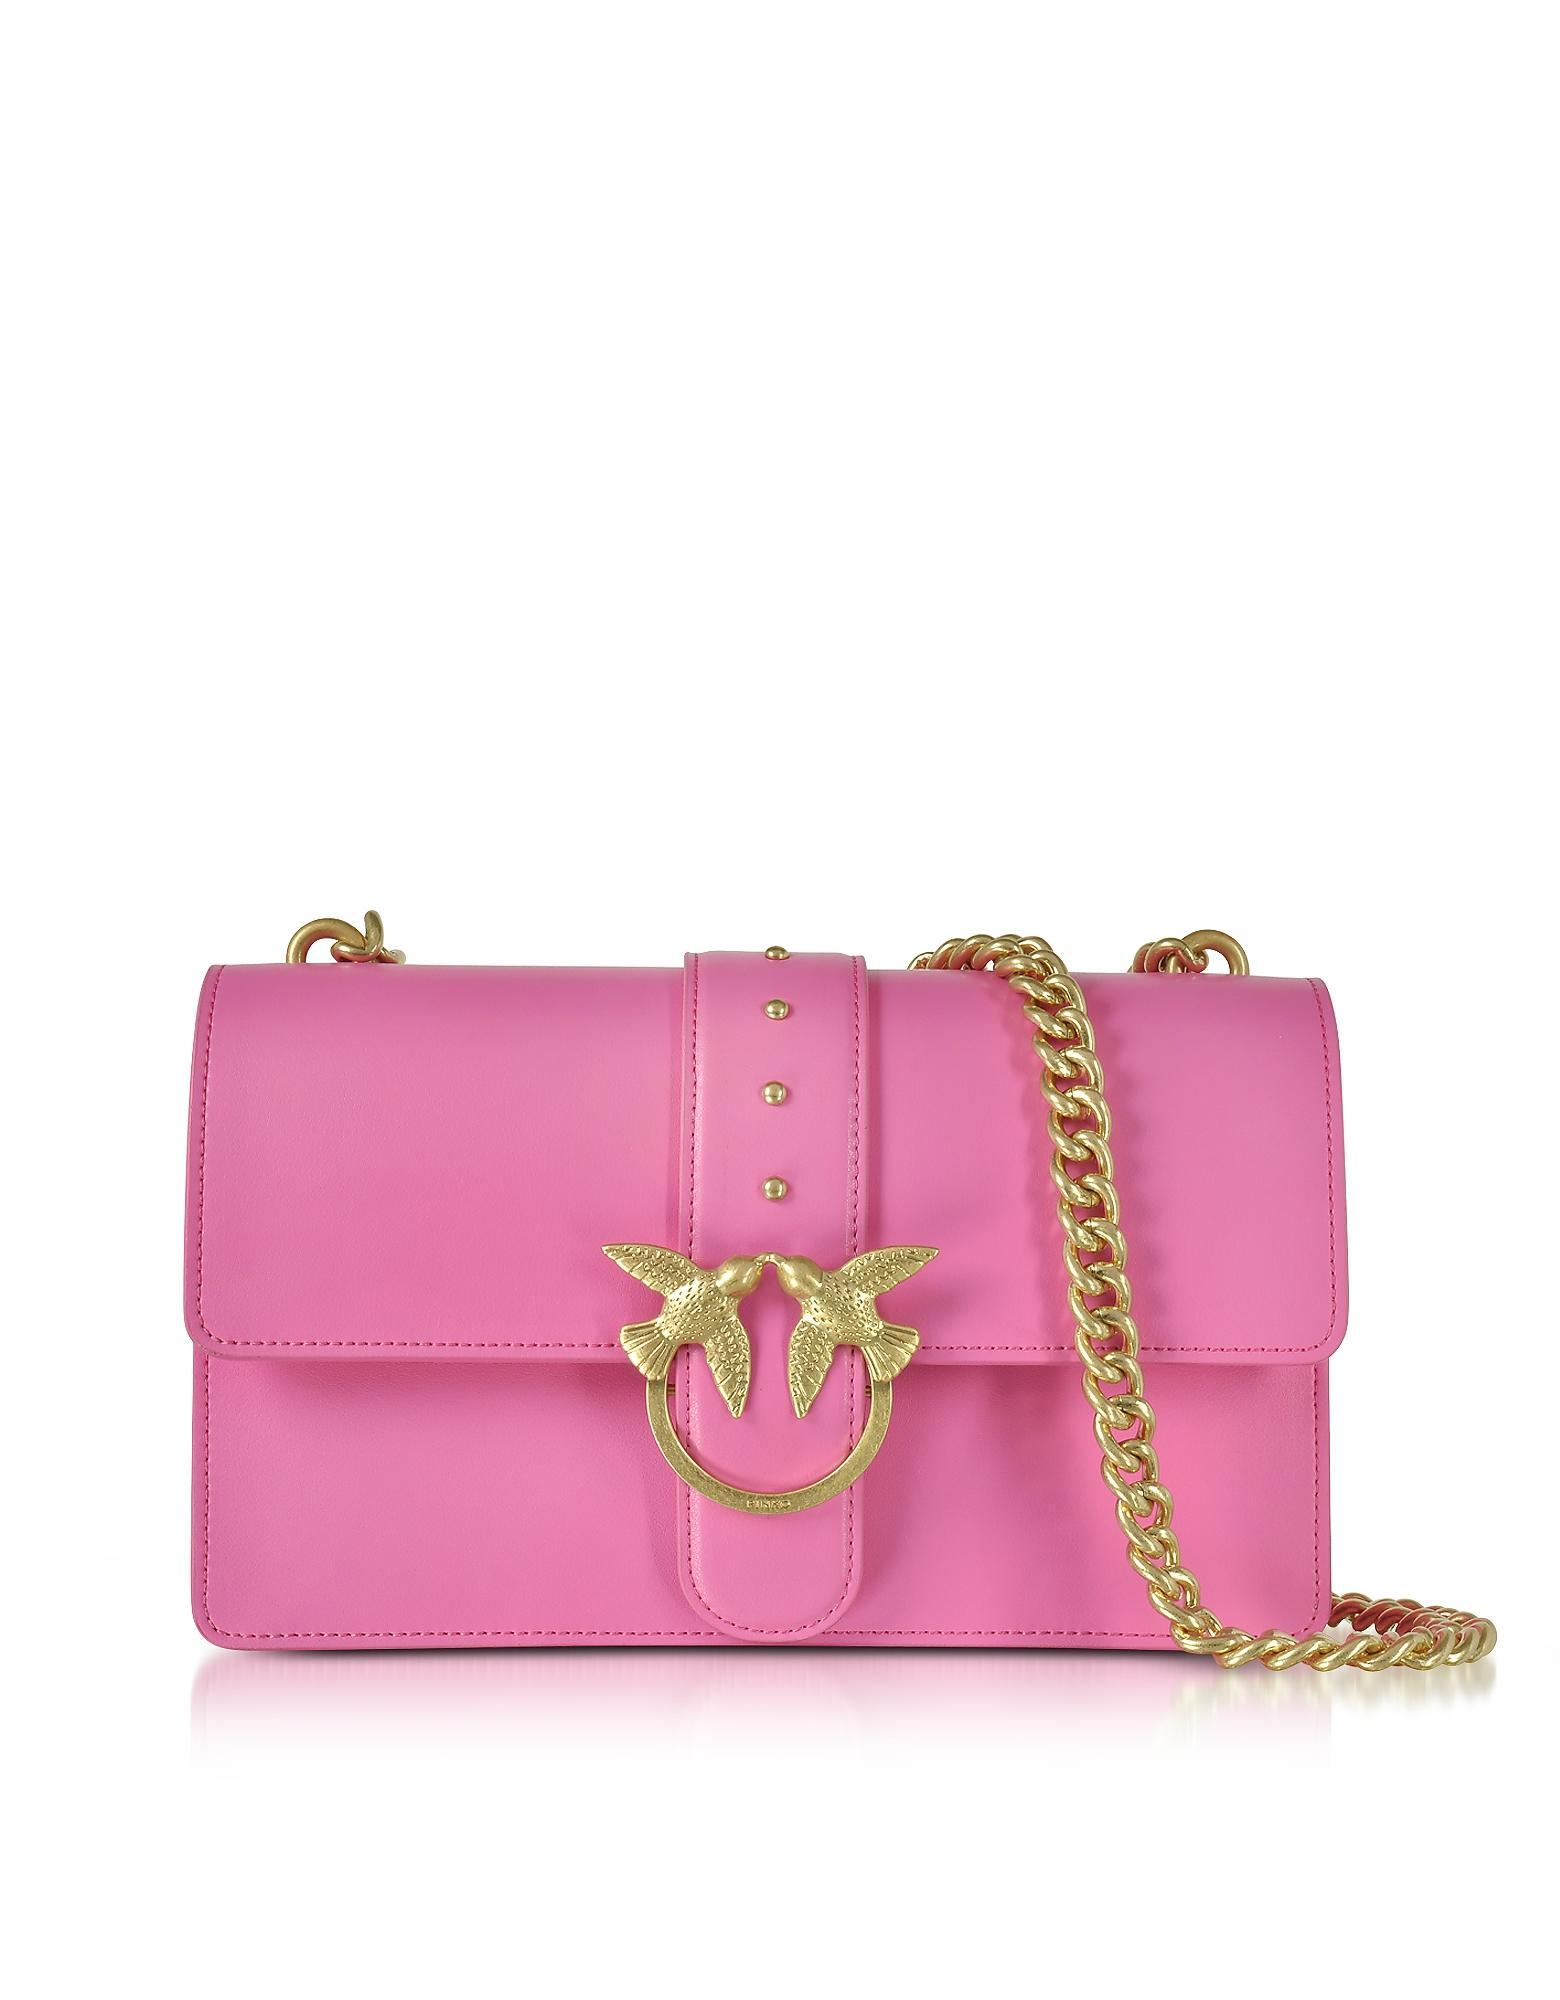 cf972e5b863 Pinko Love Simply 2 Fuchsia Eco Leather Shoulder Bag In Pink | ModeSens